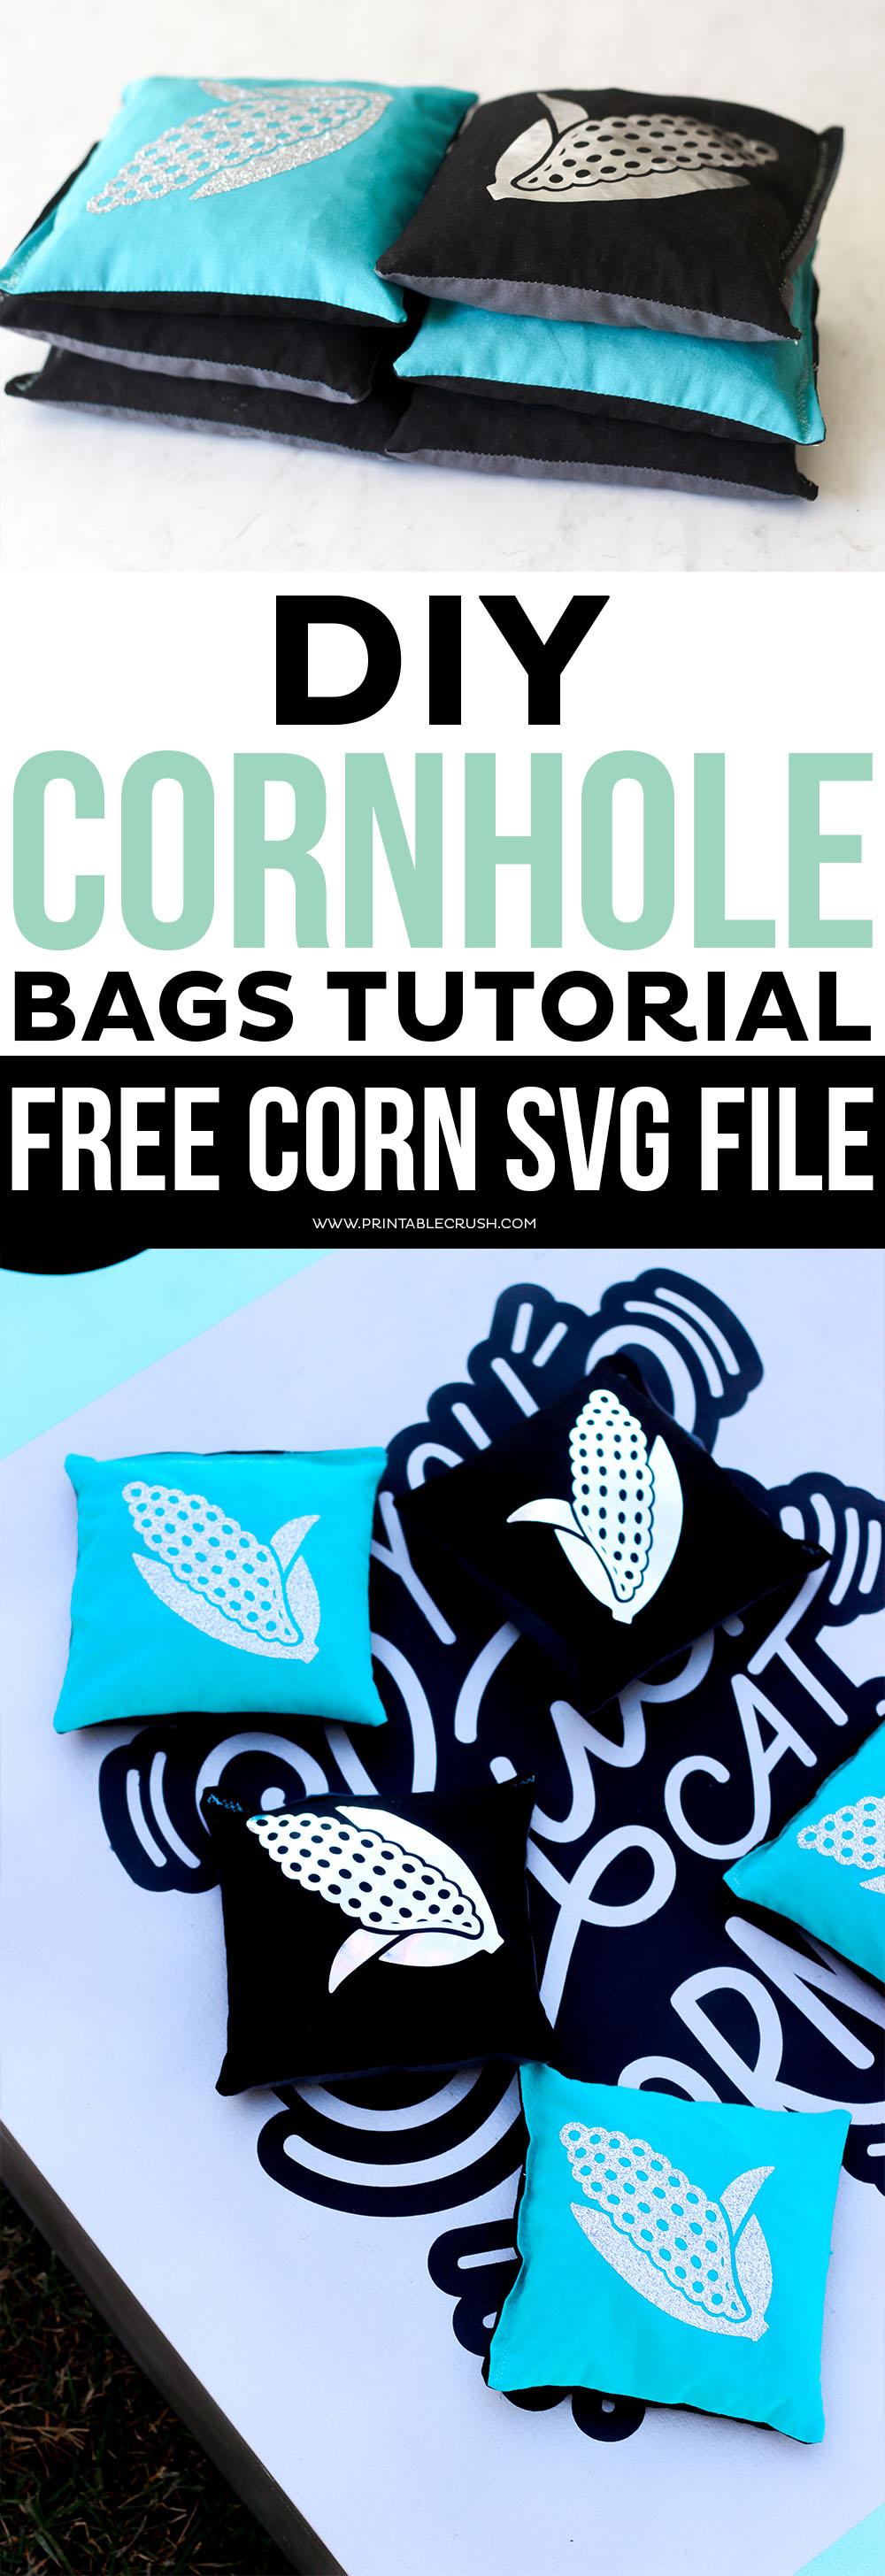 DIY Cornhole Bags Tutorial long collage